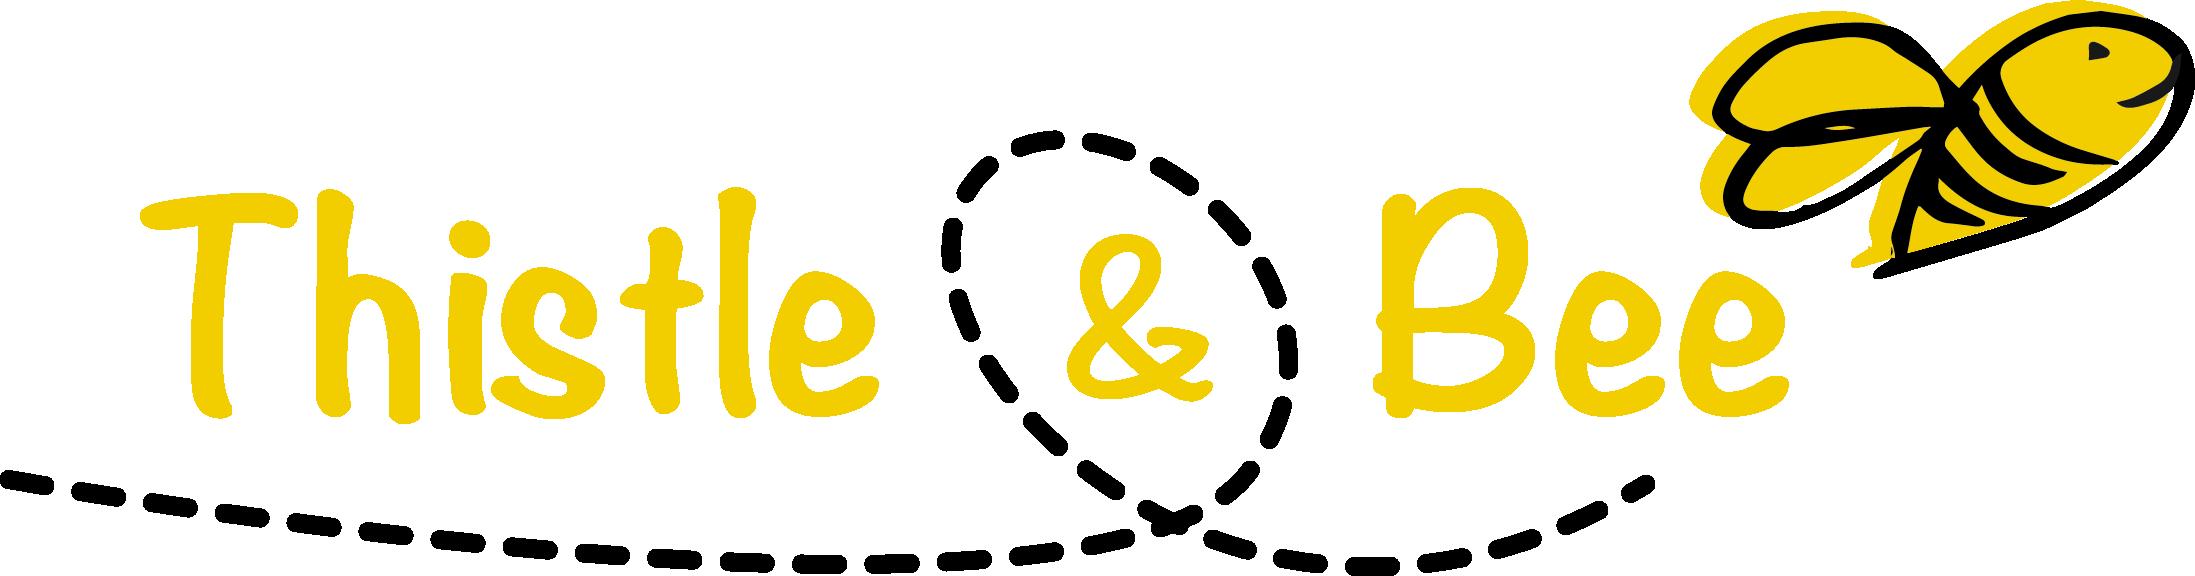 ThistleandBee Logo TRNSPRNT-03